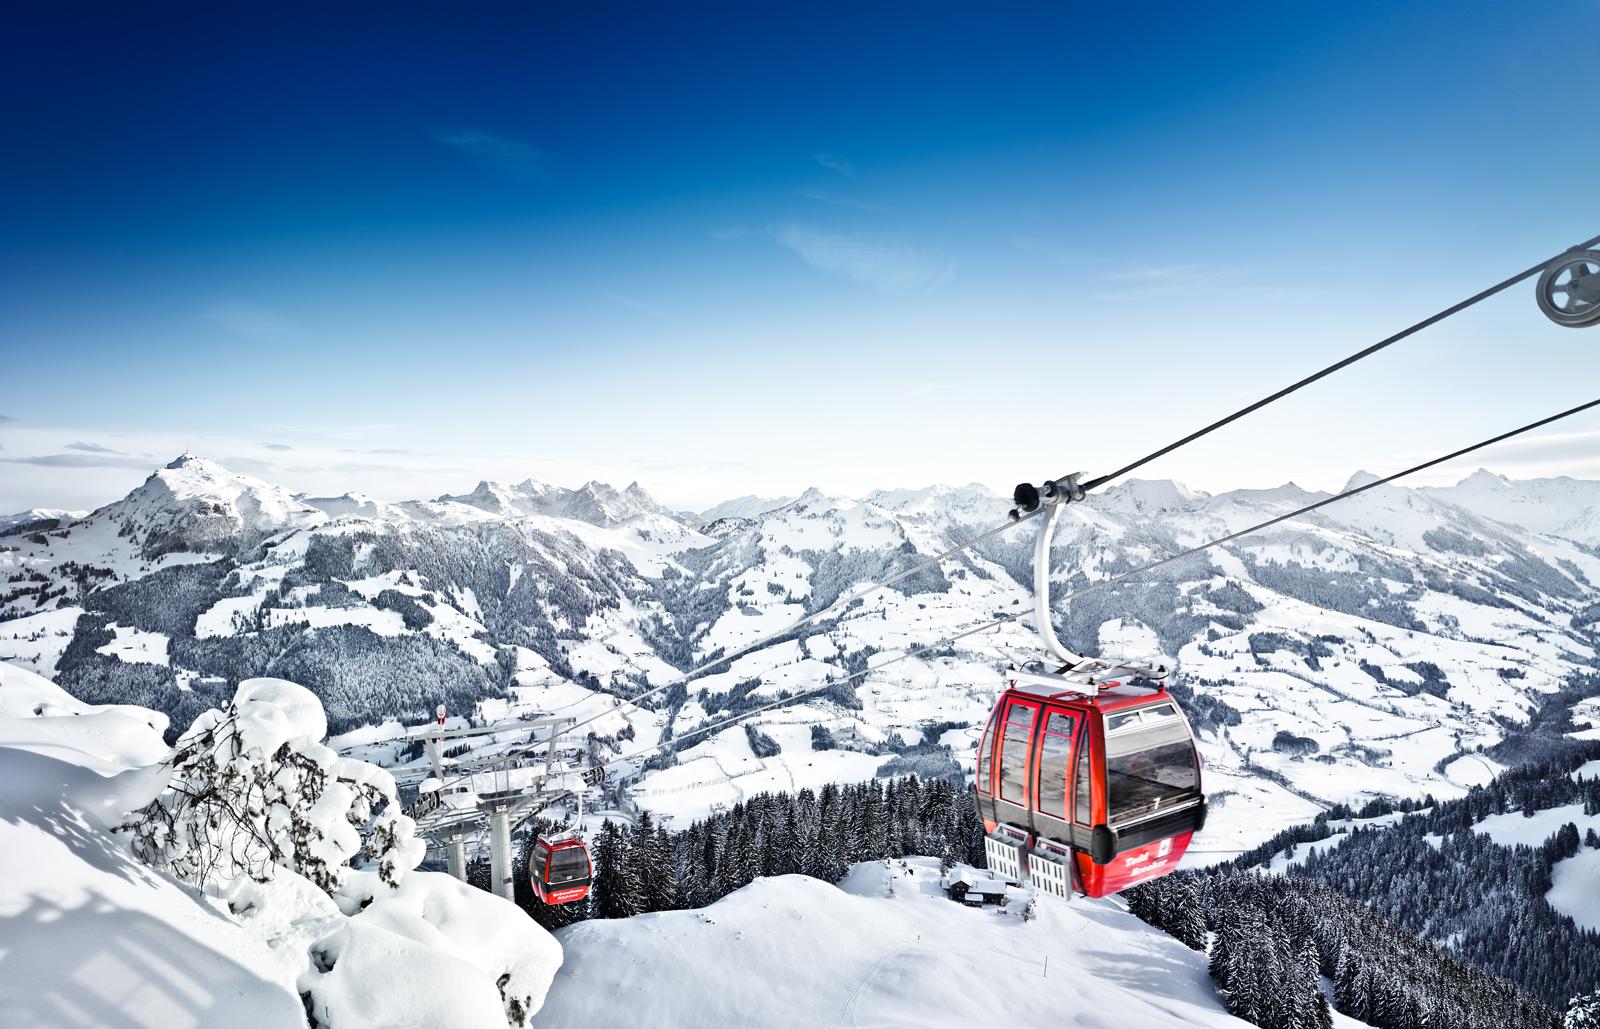 Austria - Kitzbuehel Ski Resort